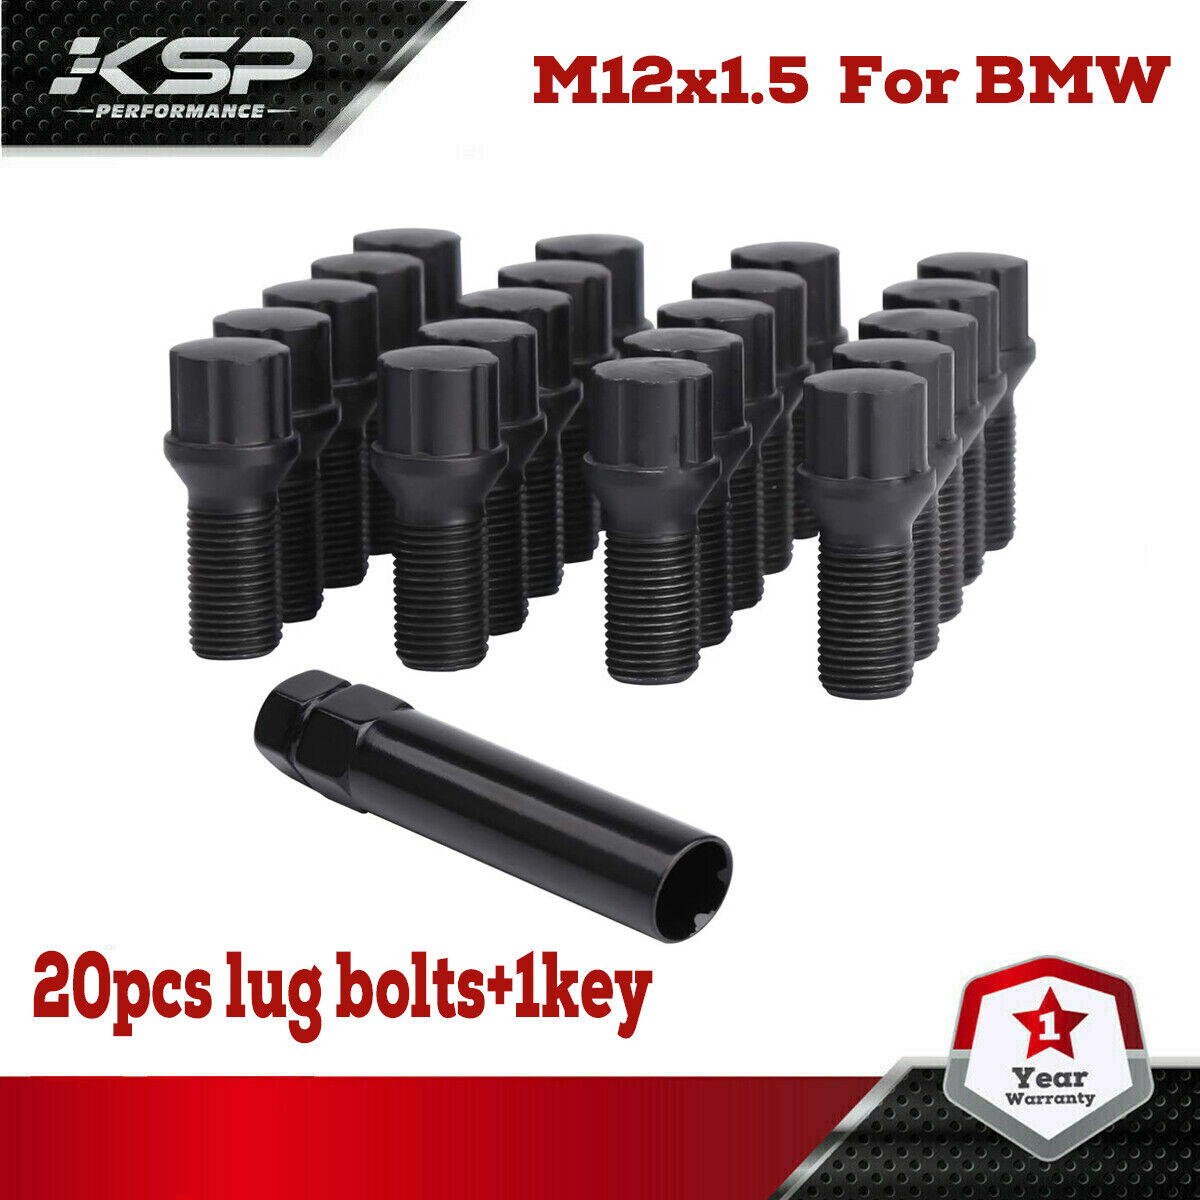 20 BMW Black Lug Bolt Wheel Locks + Key 12x1.5 For M3 M5